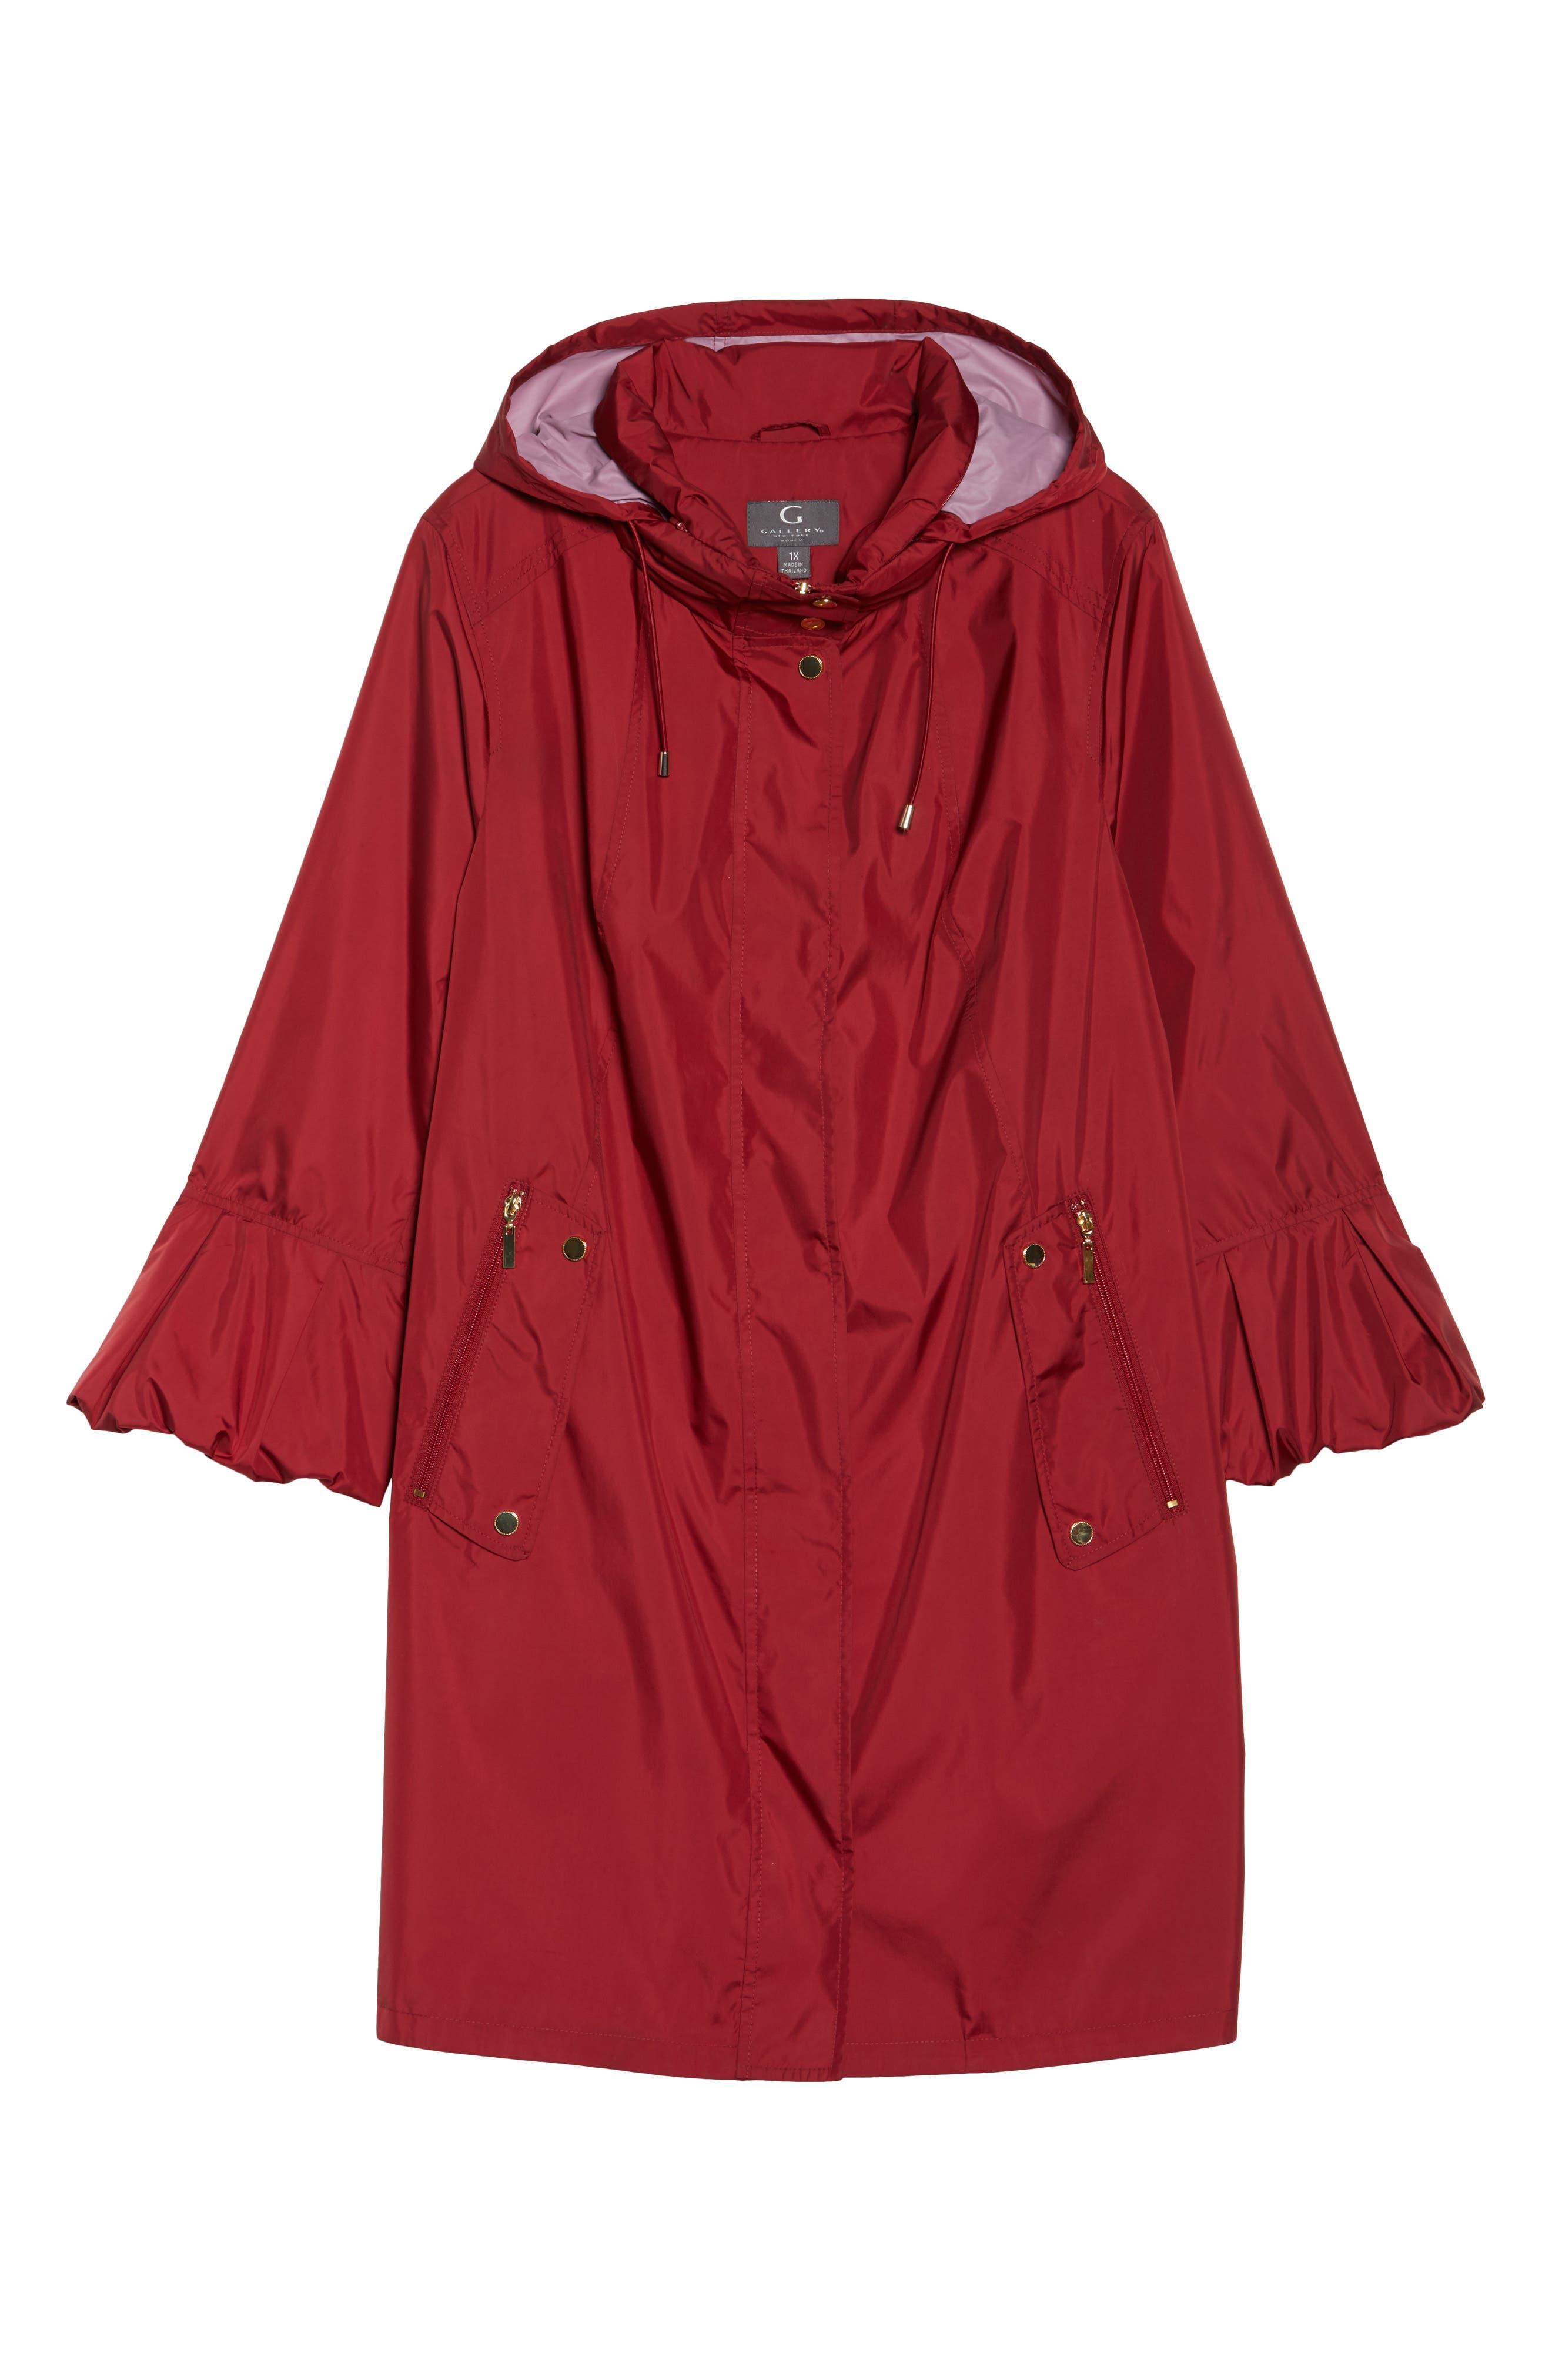 Flare Sleeve Packable Swing Jacket,                             Alternate thumbnail 7, color,                             Garnet